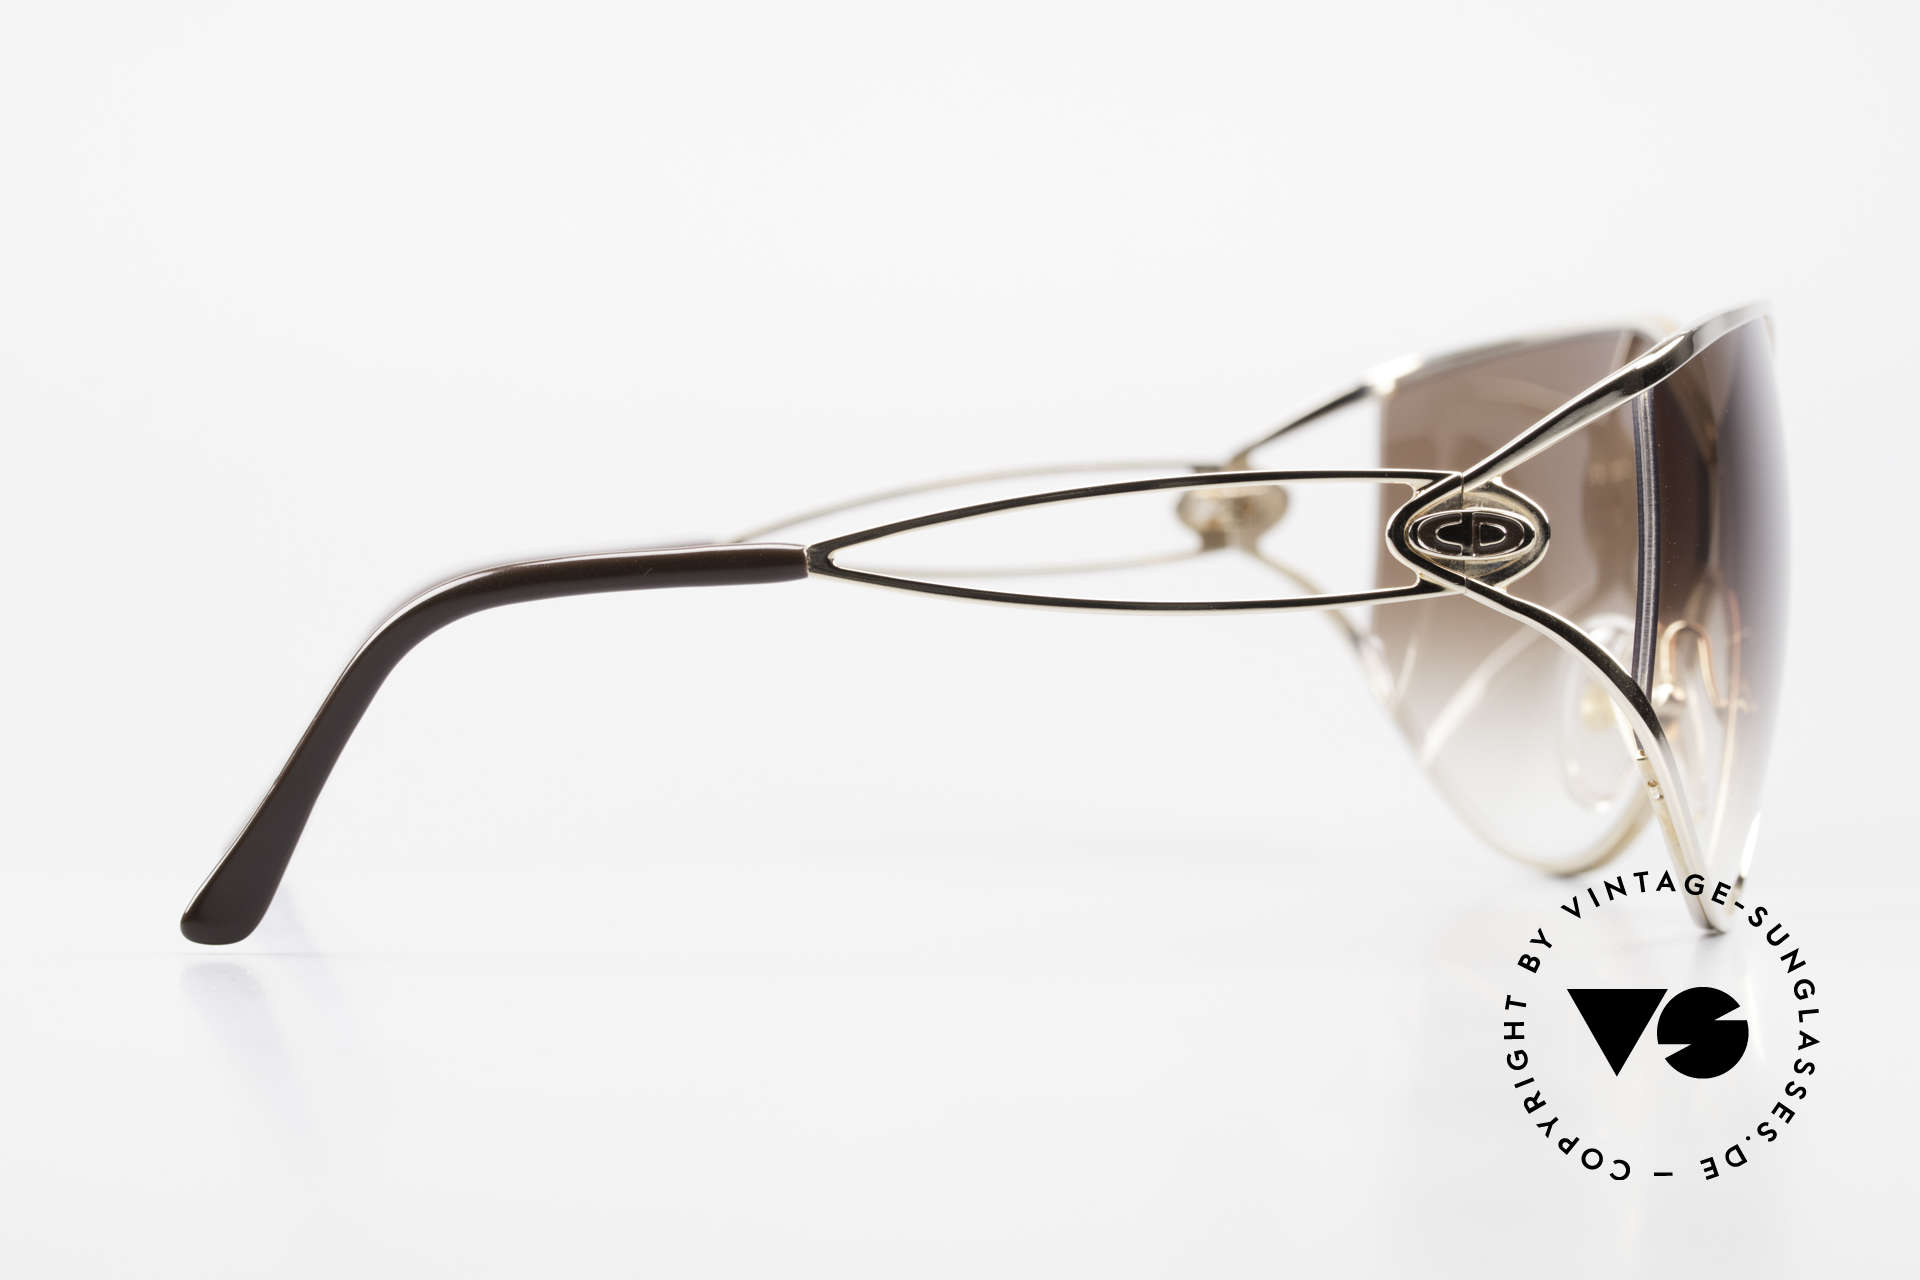 Christian Dior 2345 Ladies 90s Designer Sunglasses, brown-gradient sun lenses; 100% UV protection, Made for Women